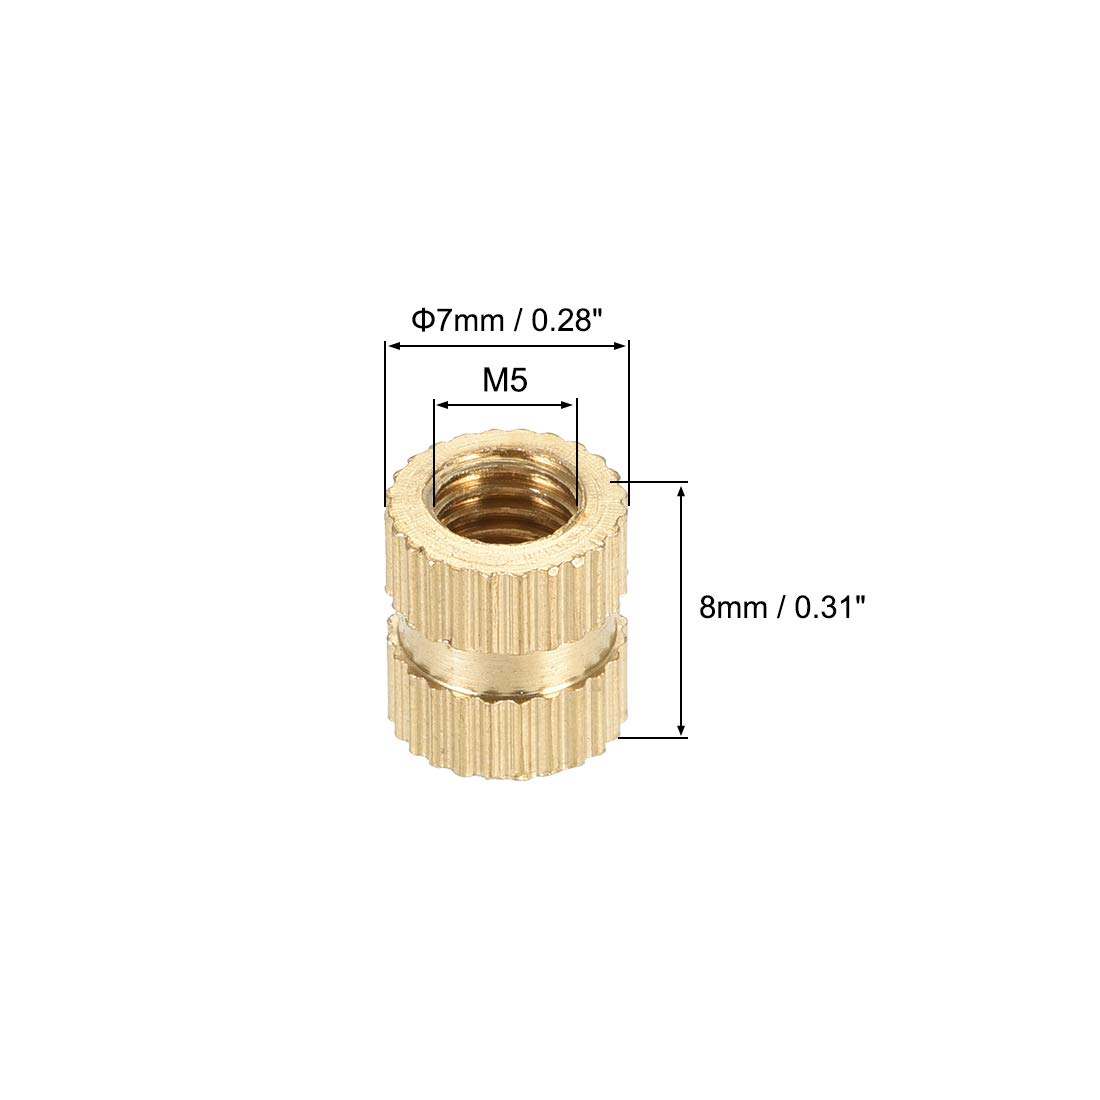 Tuercas de inserci/ón roscadas y moleteadas de lat/ón 30 ud. x 7mm L DO sourcing map M5 x 16mm